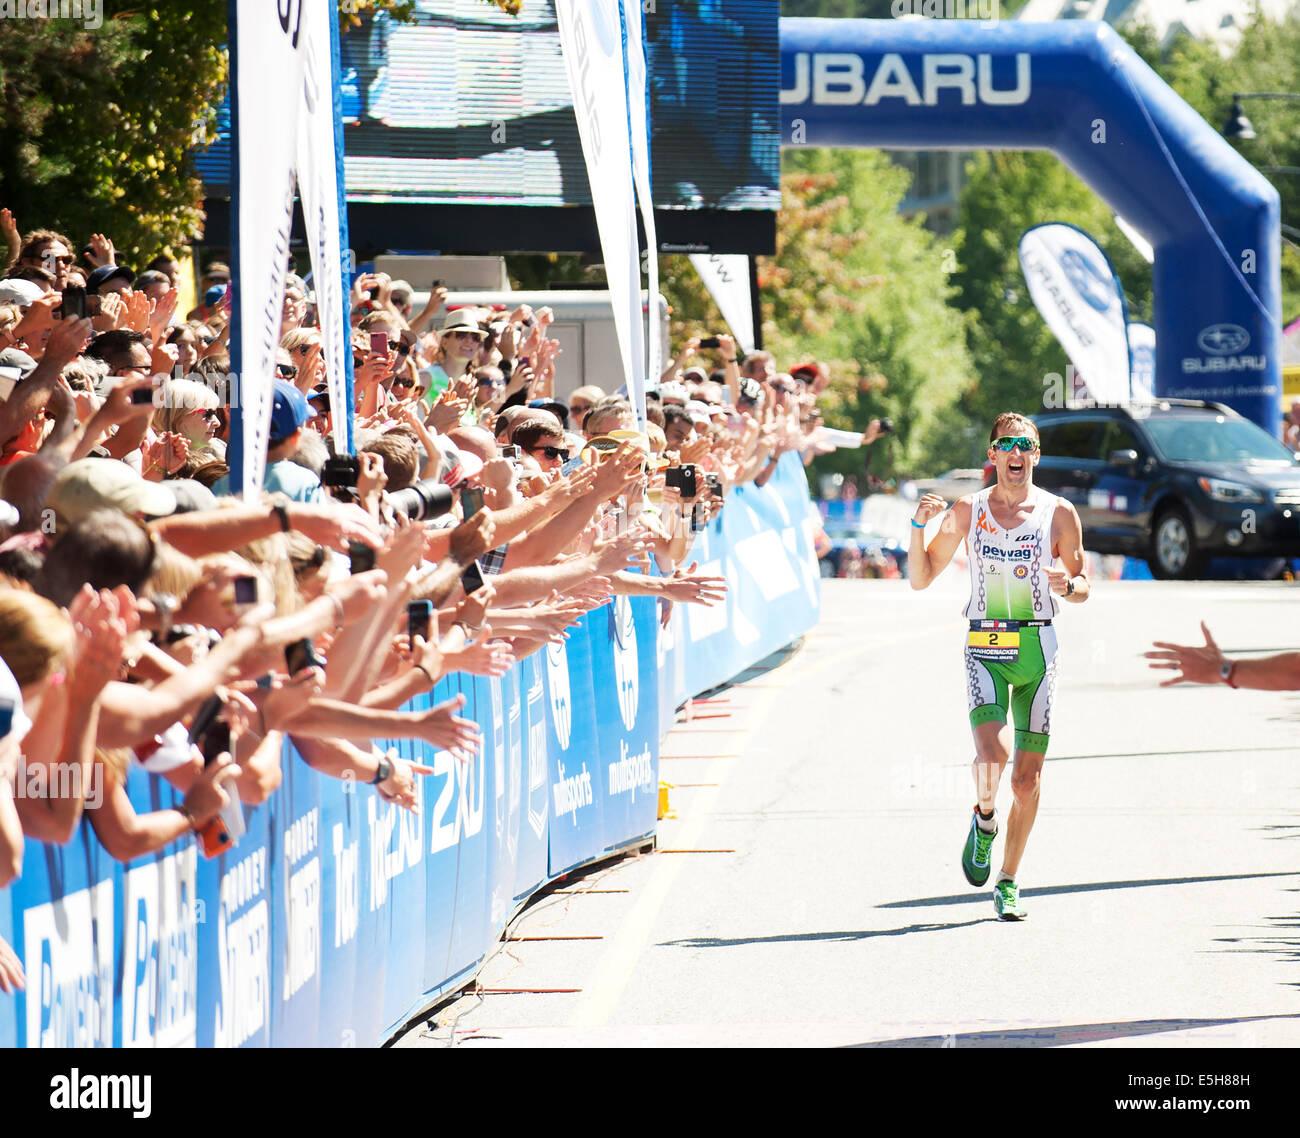 Winner Marino Vanhoenacker at the finish line.  2014 Canadian Ironman.  Whistler BC, Canada.  July 27th, 2014.  - Stock Image